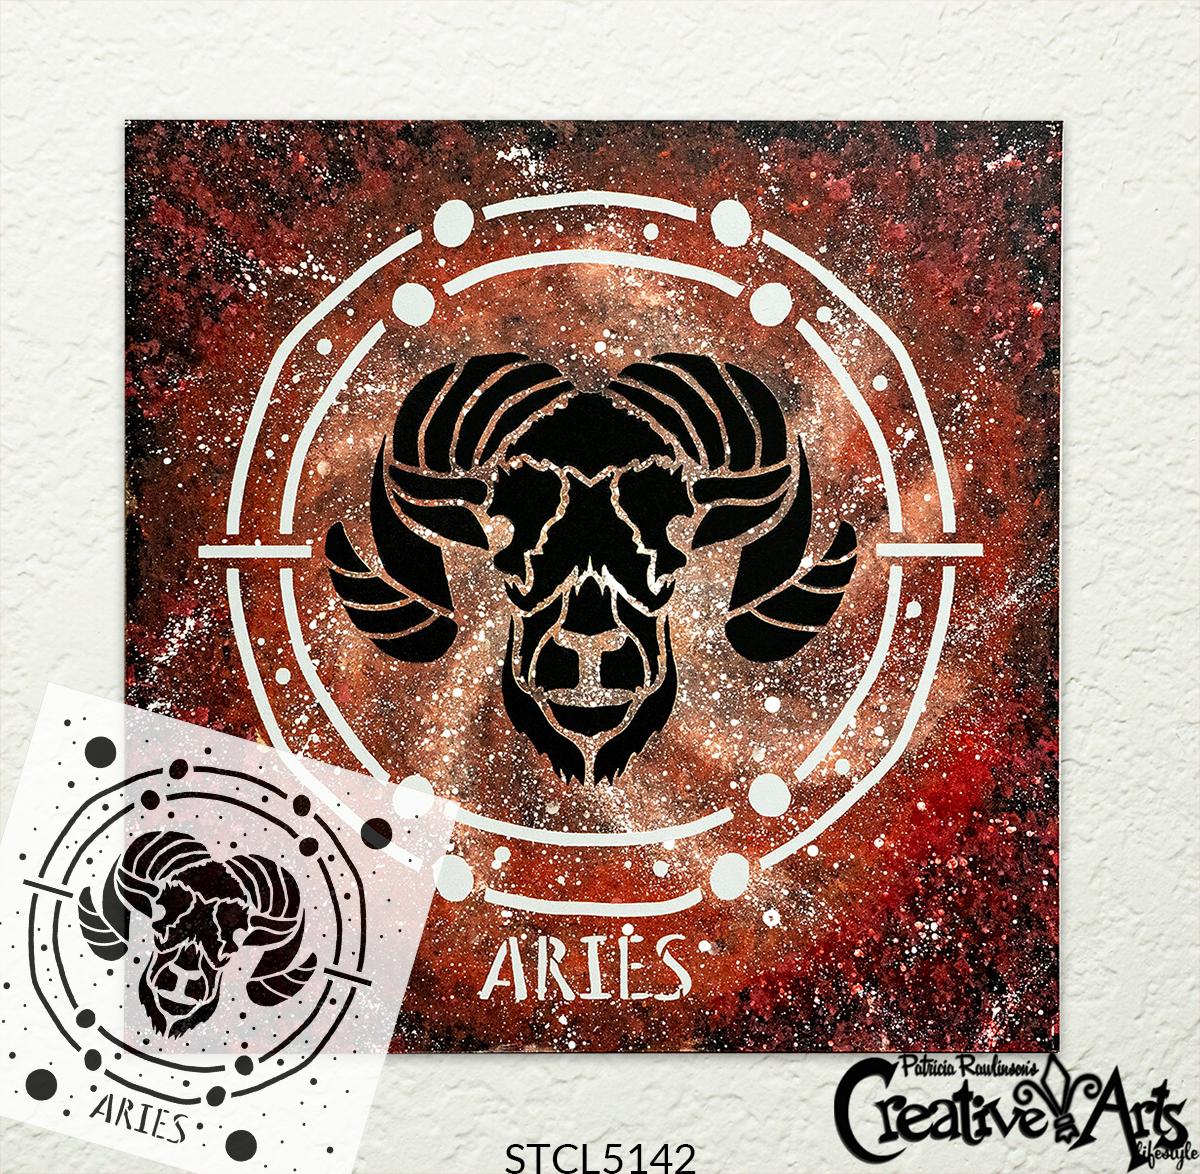 5142-aries-whitebackground-with-stencil-sku-cal-logo.jpg